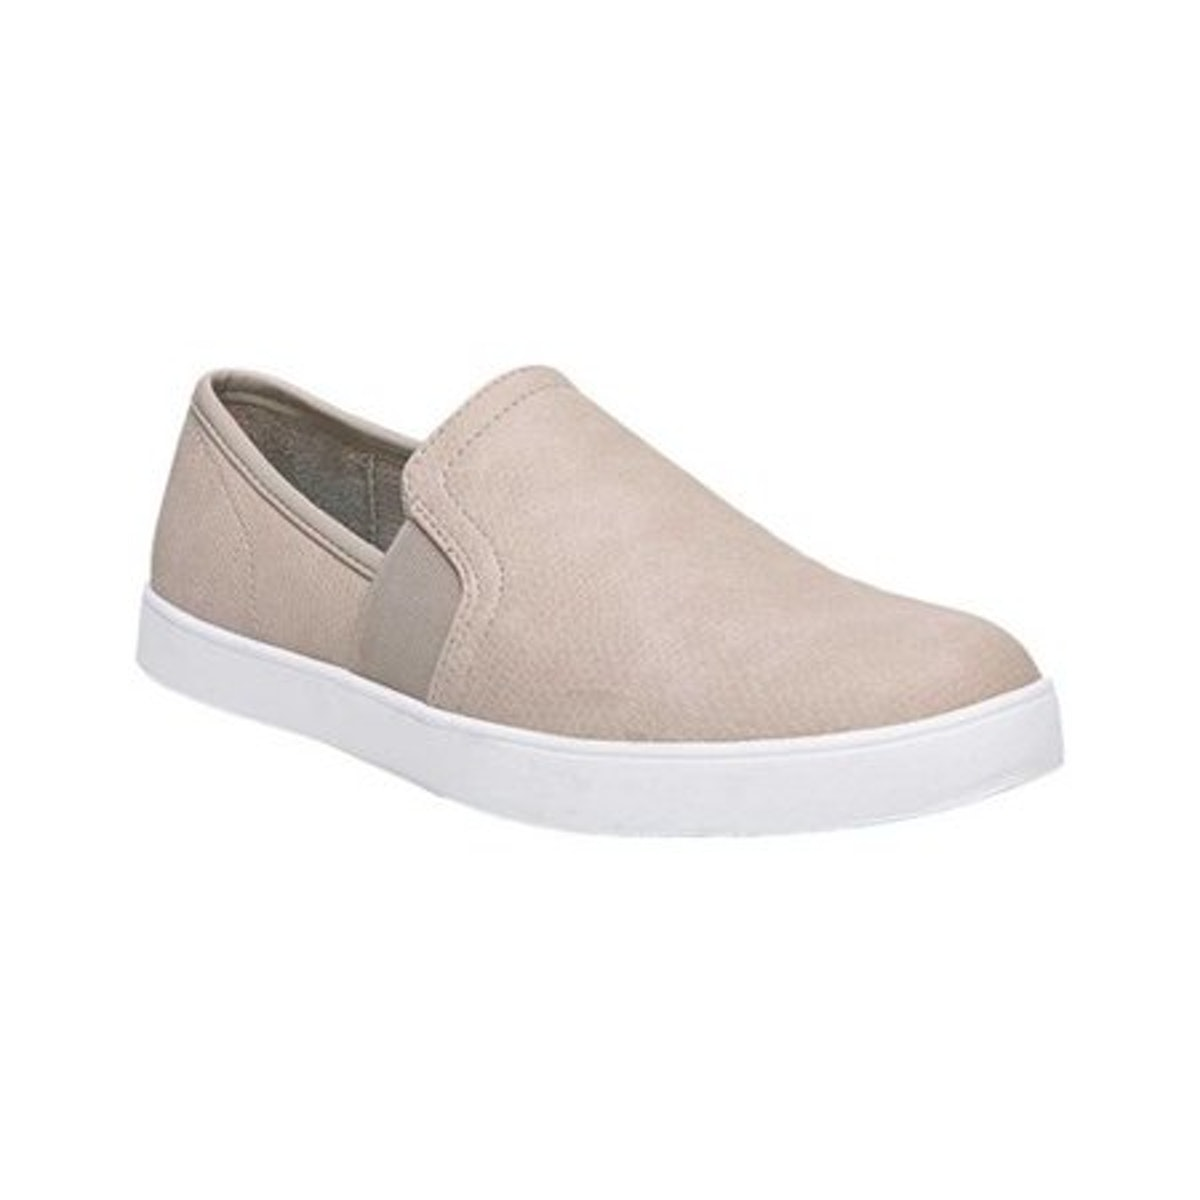 Dr. Scholl's Women's Dr. Scholl's Luna Slip On Sneaker